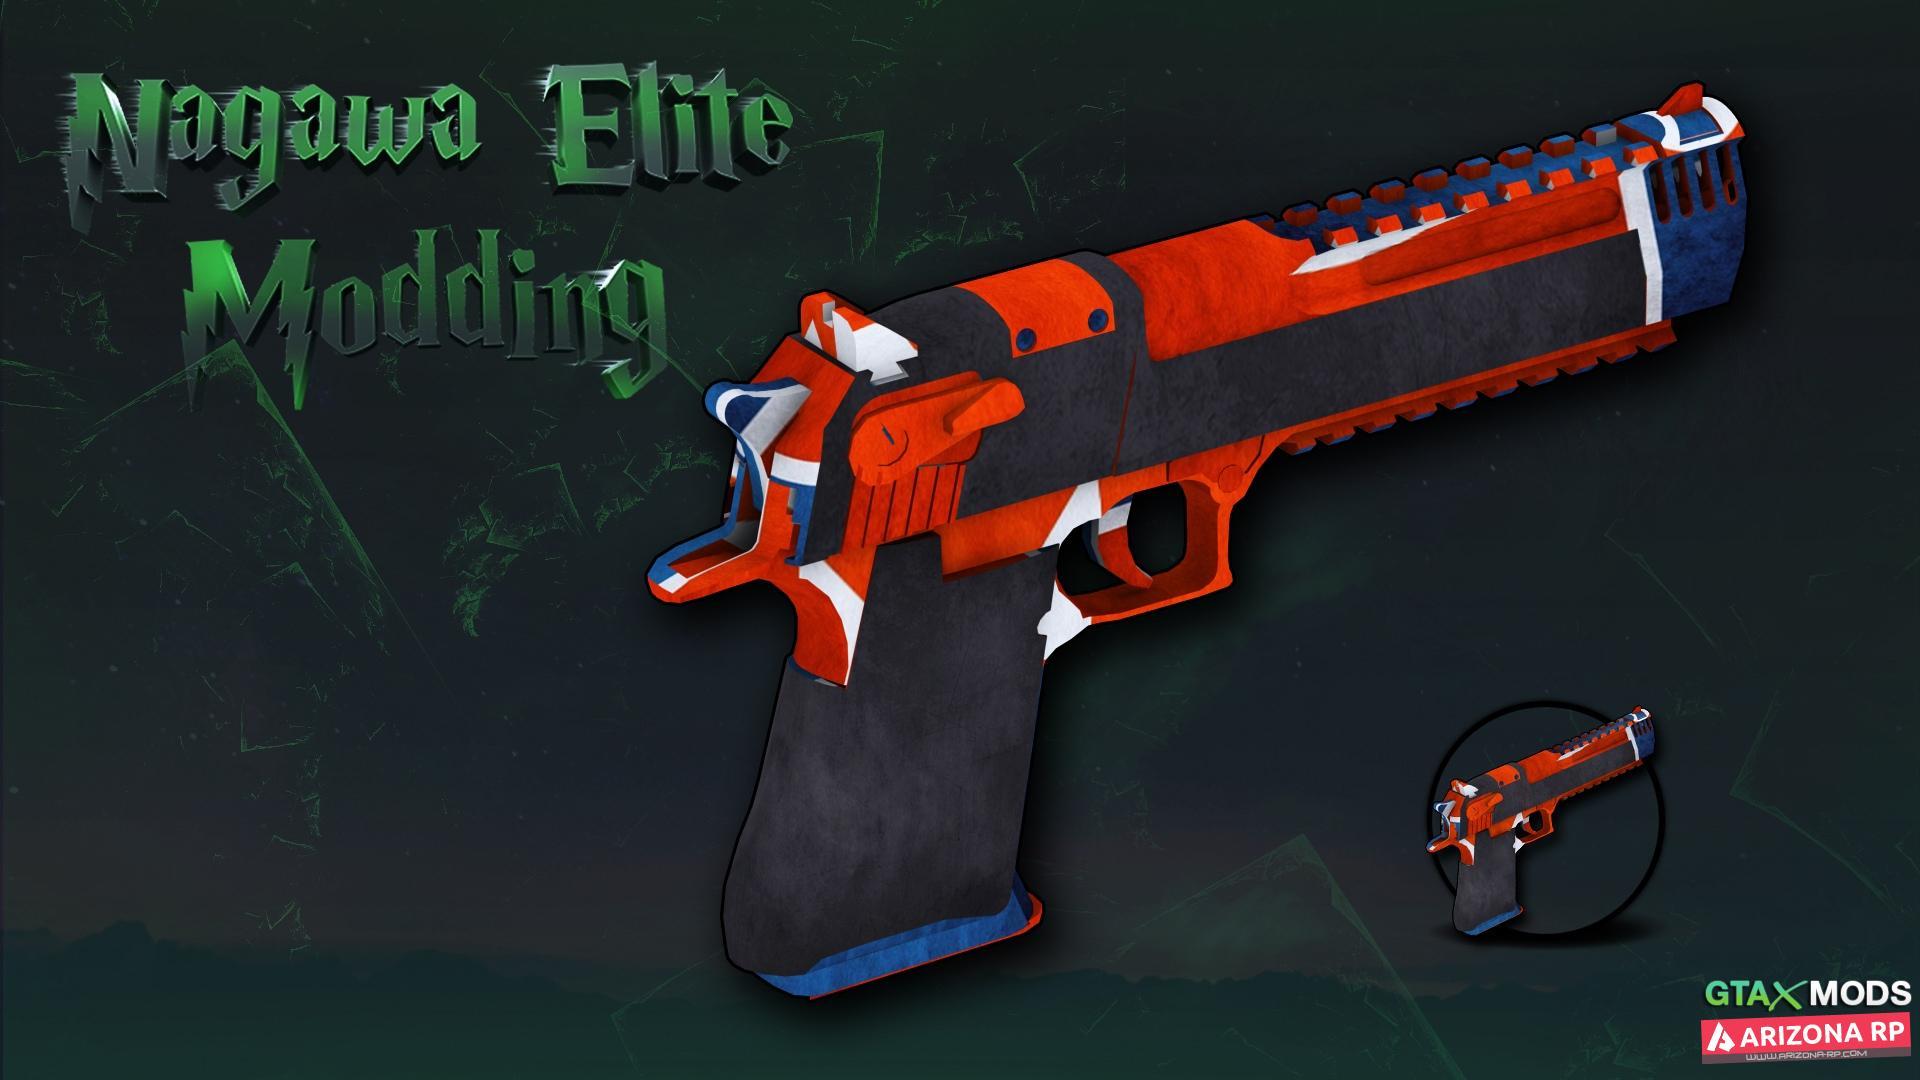 Desert Eagle | Nagawa Elite Modding